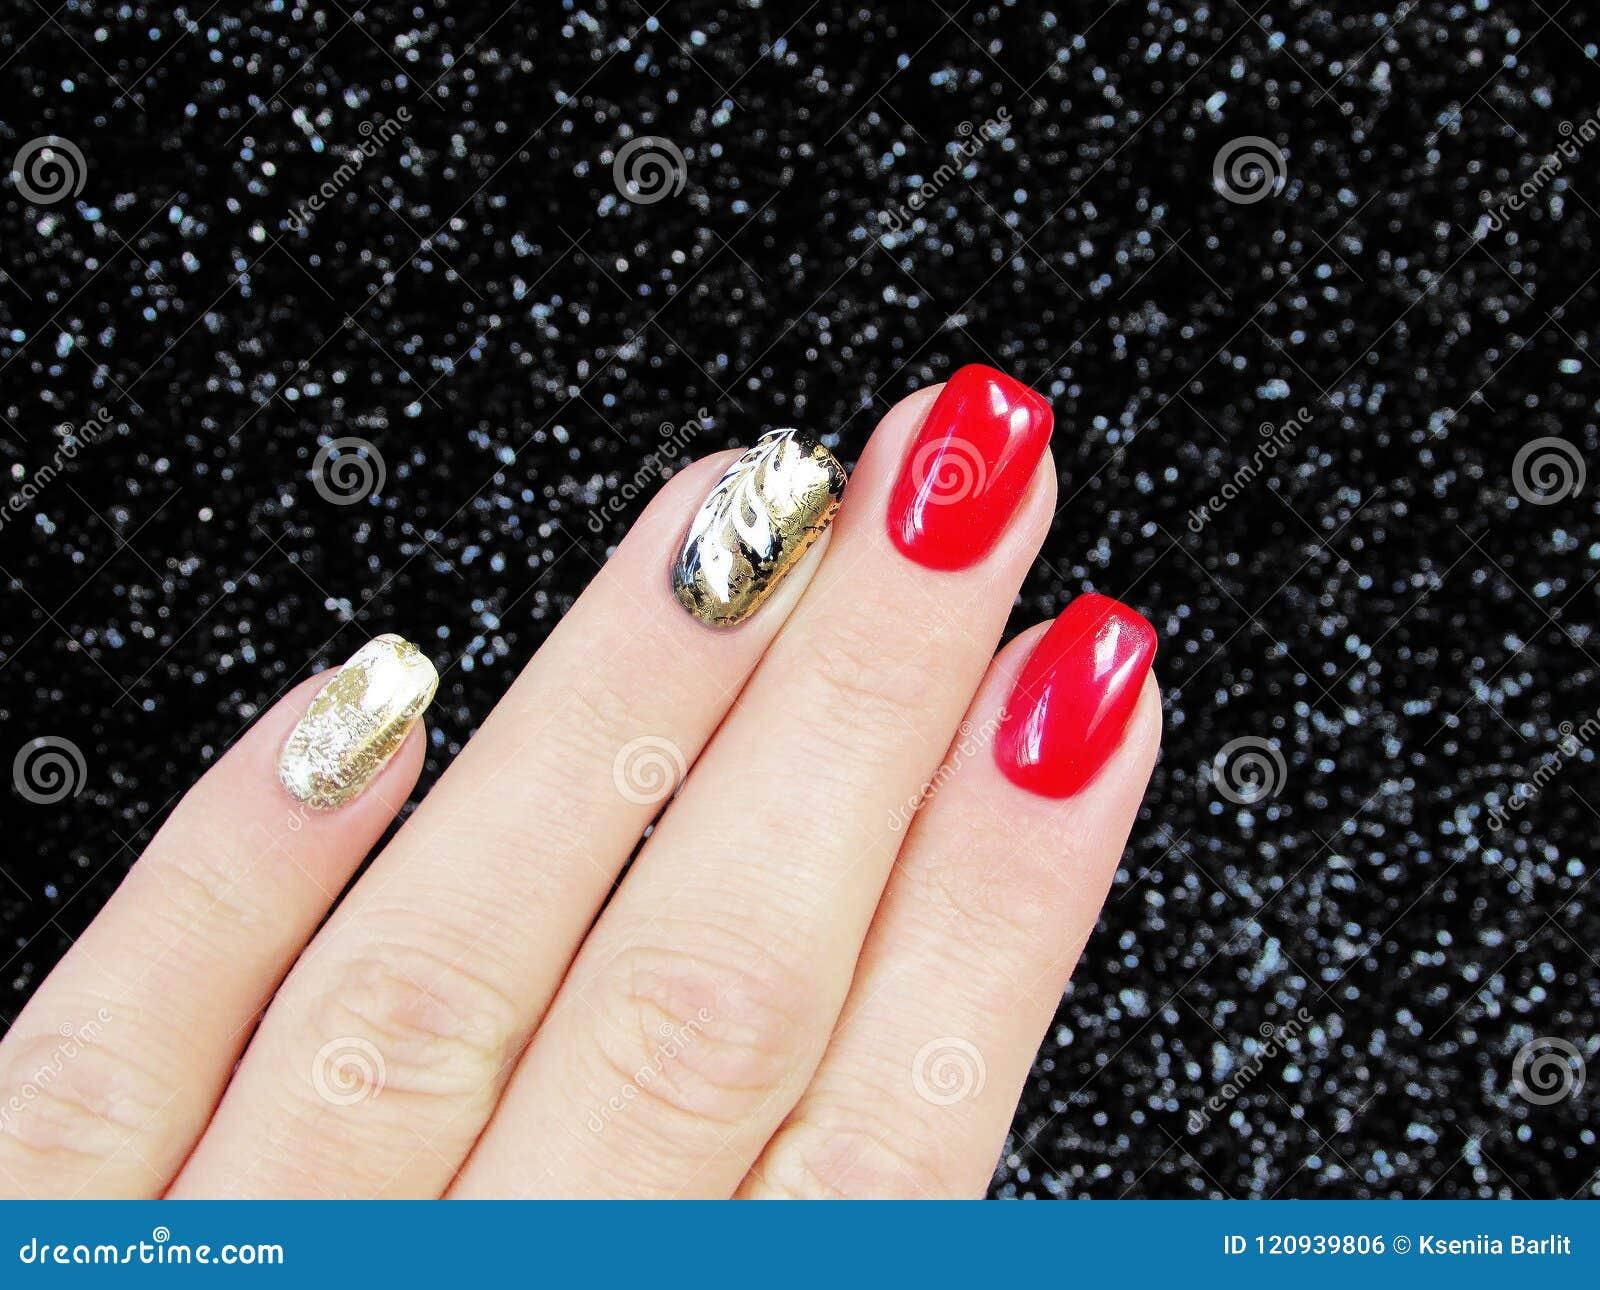 Manicure Les Ongles Avec De L\u0027or D\u0027aluminium, Rouge, Blanc